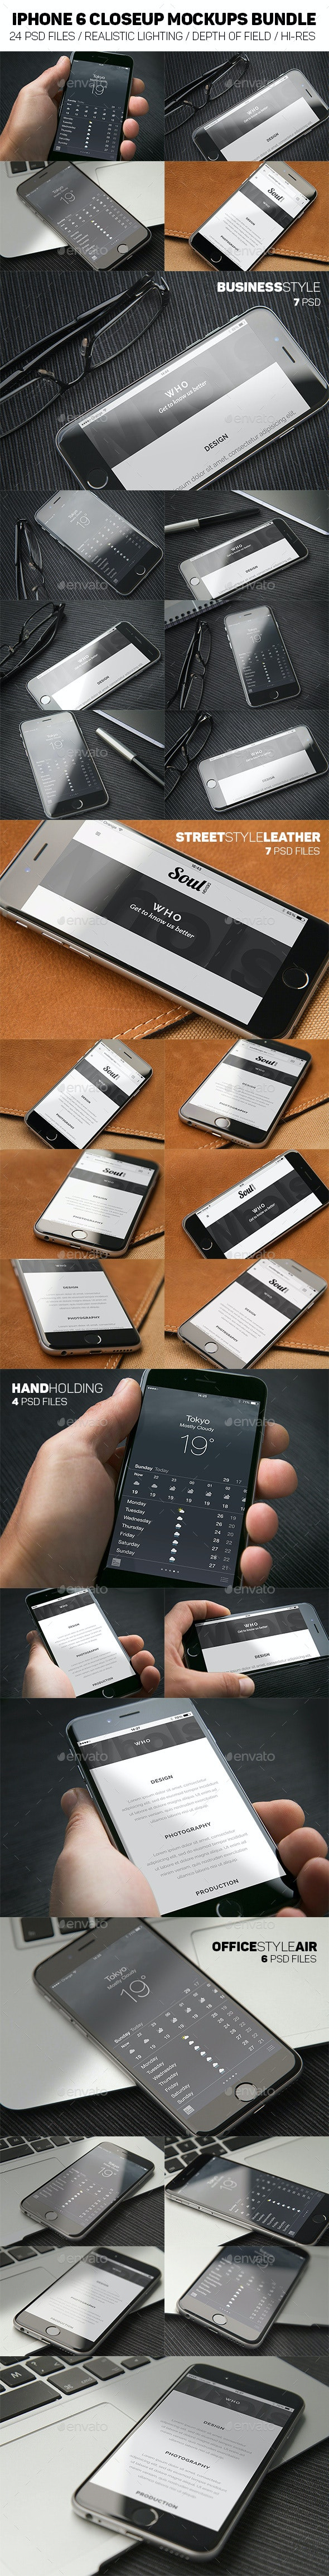 iPhone 6 Closeup Mockups Bundle - Mobile Displays